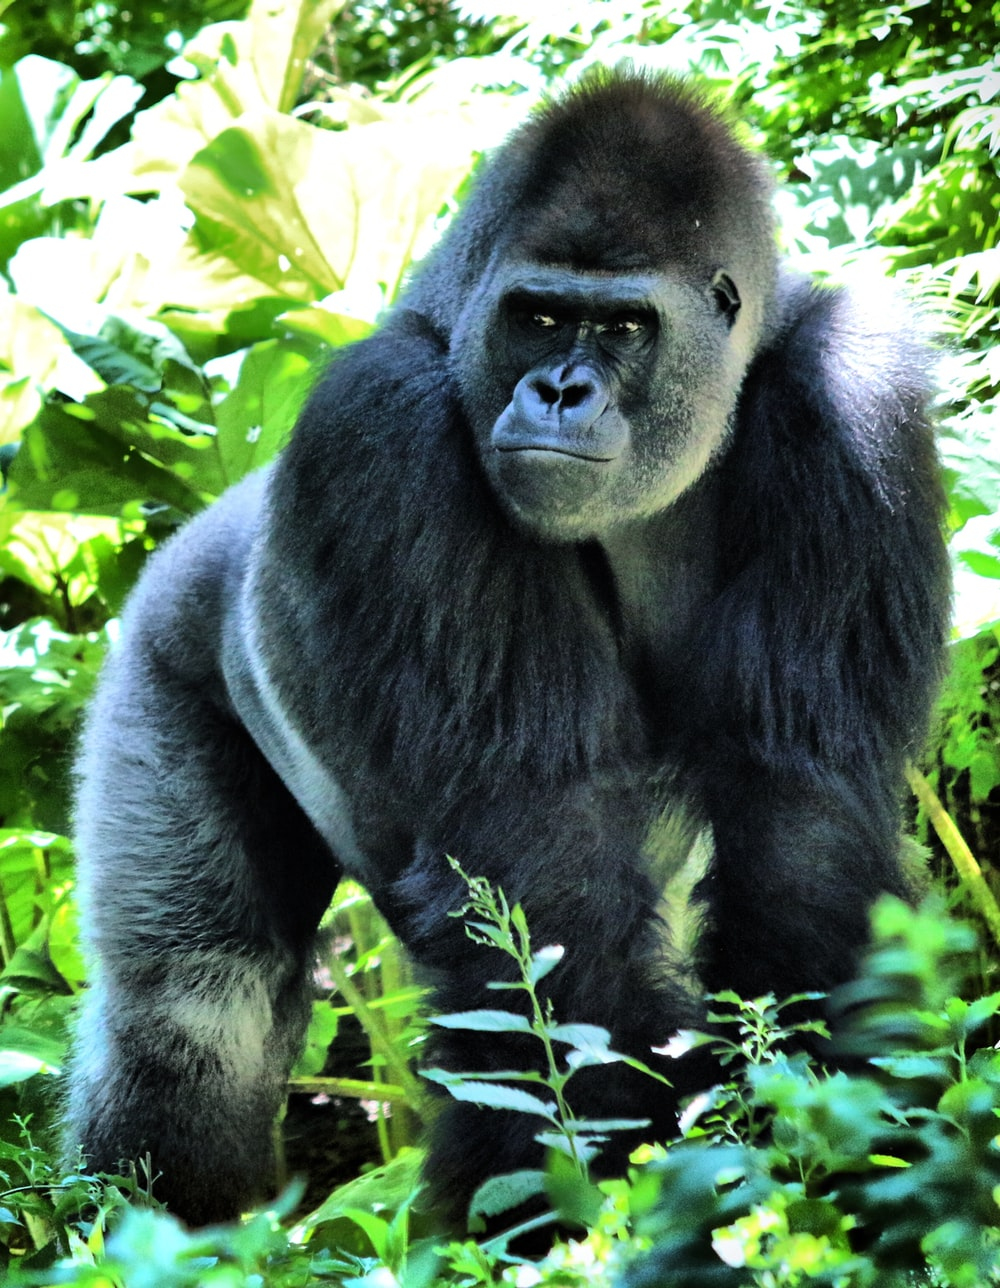 black gorilla under green leaves